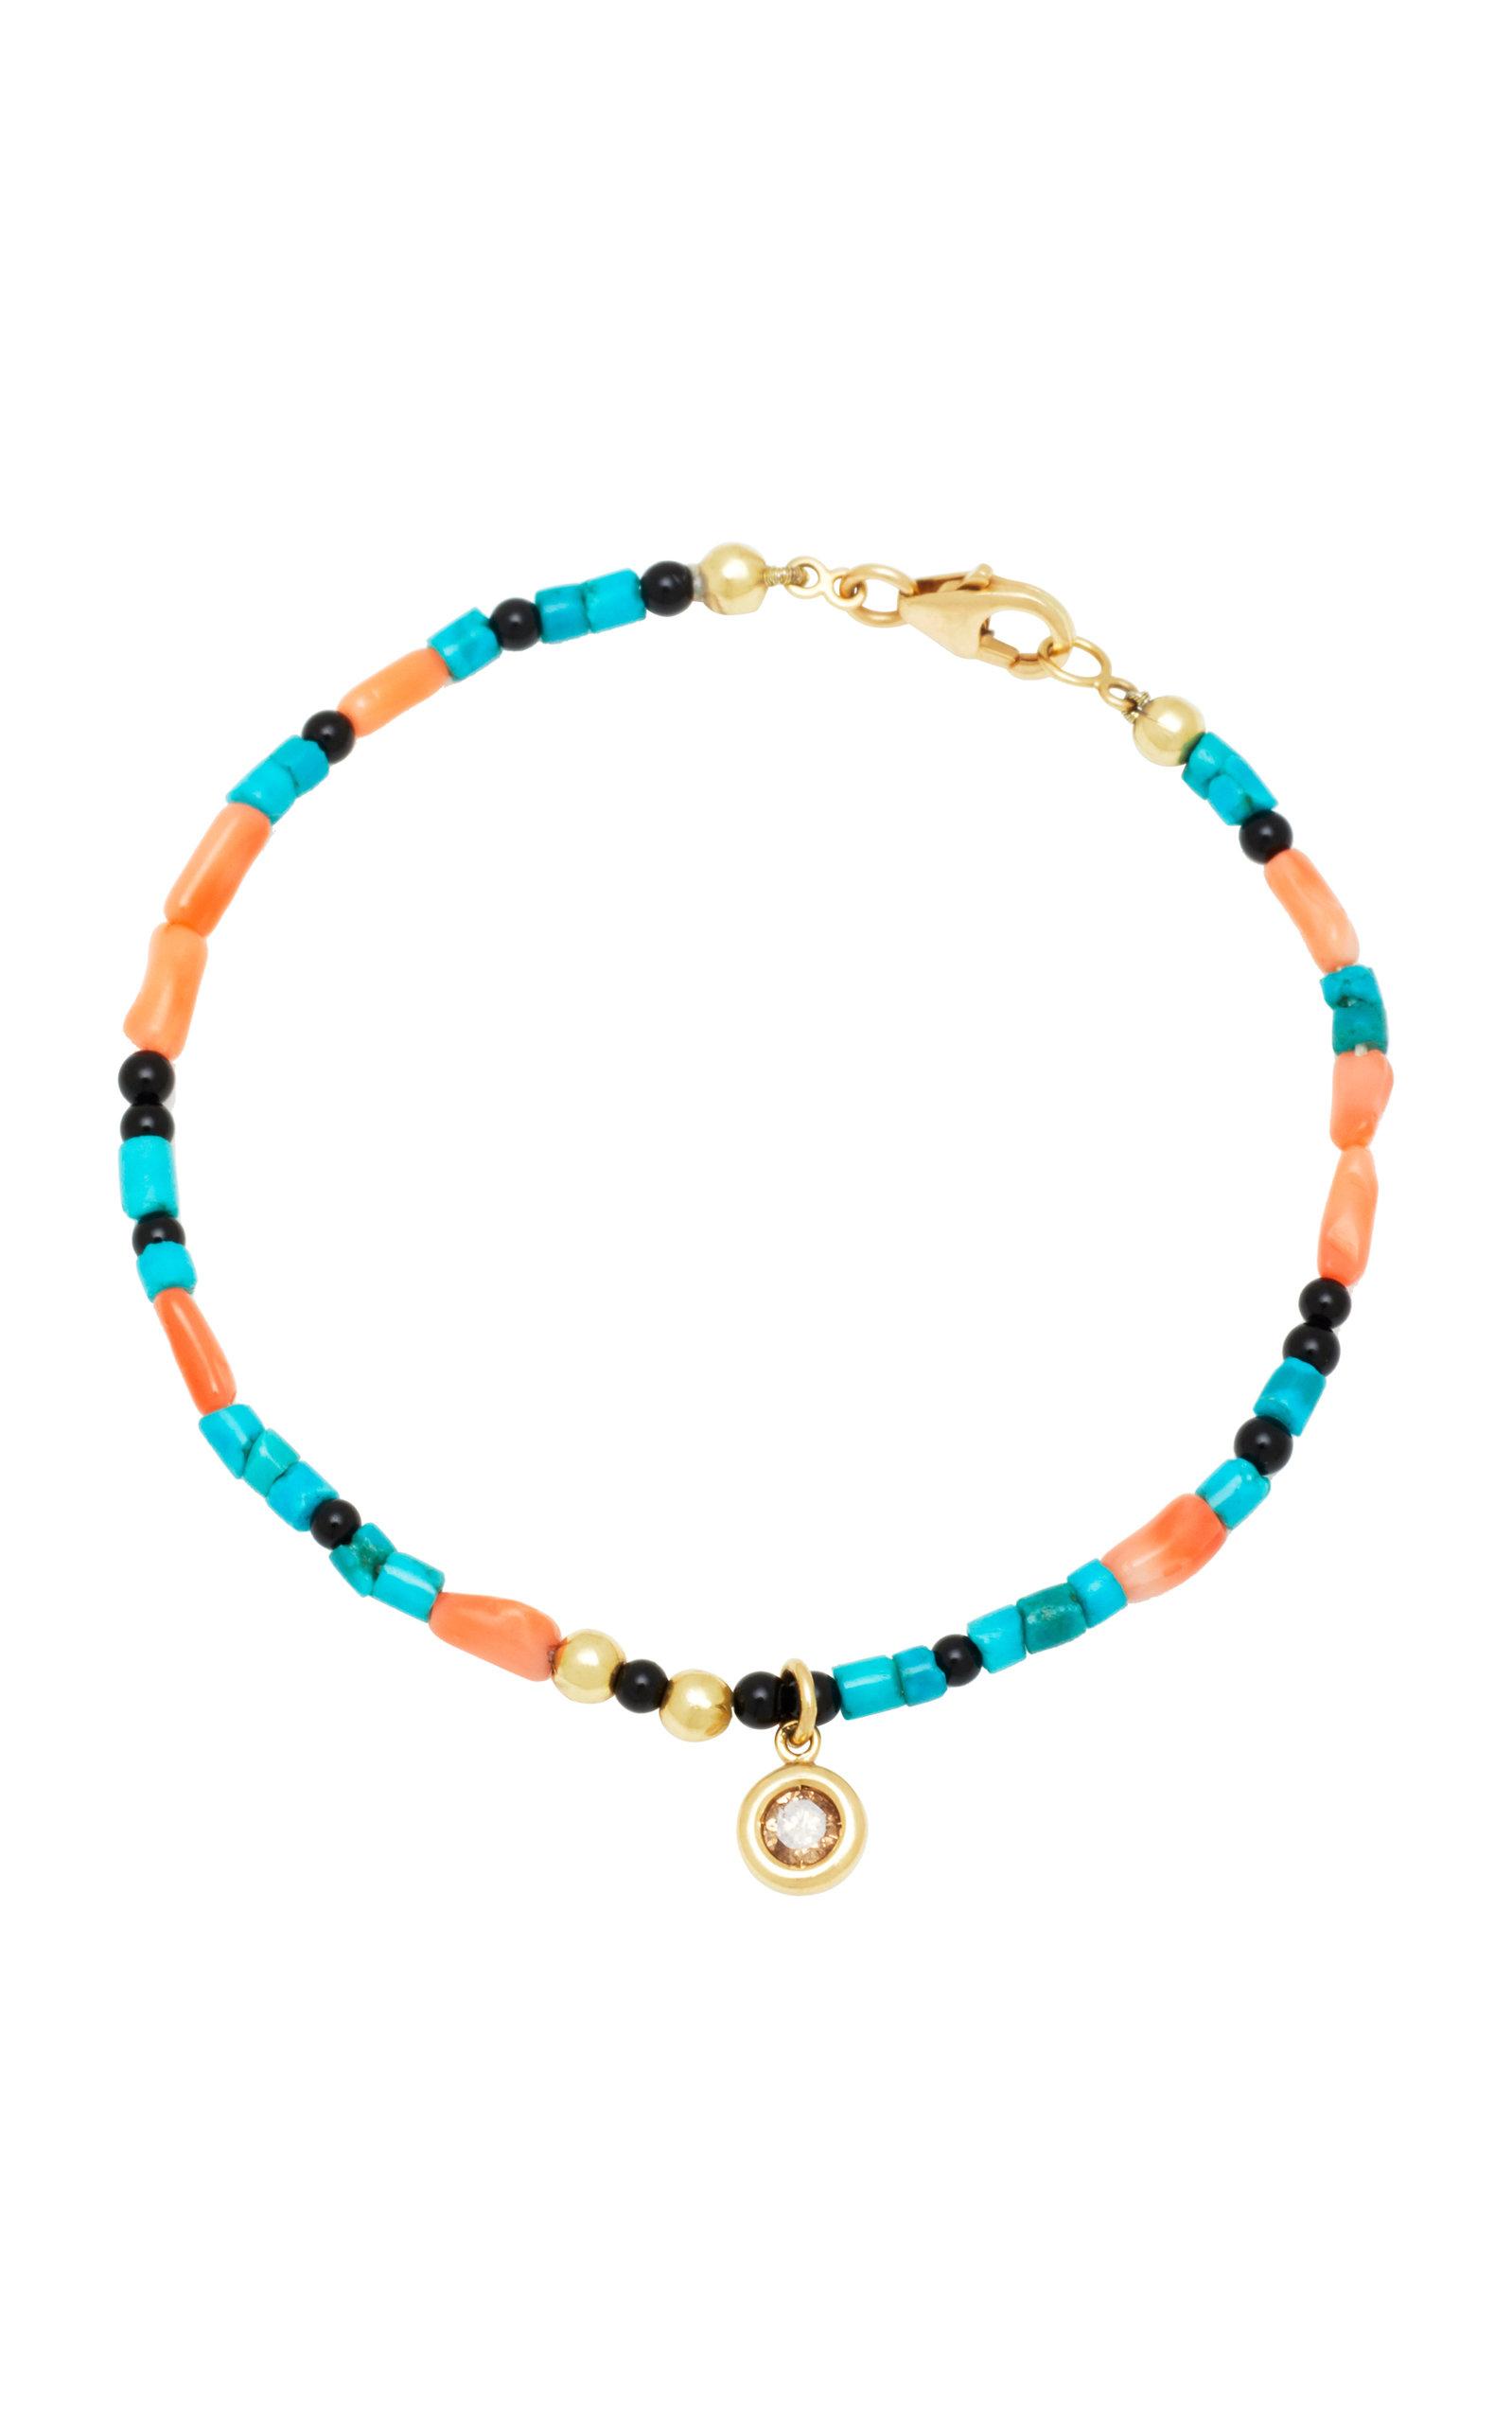 ARON & HIRSCH Surma 18K Gold Agate Bead And Diamond Bracelet in Multi